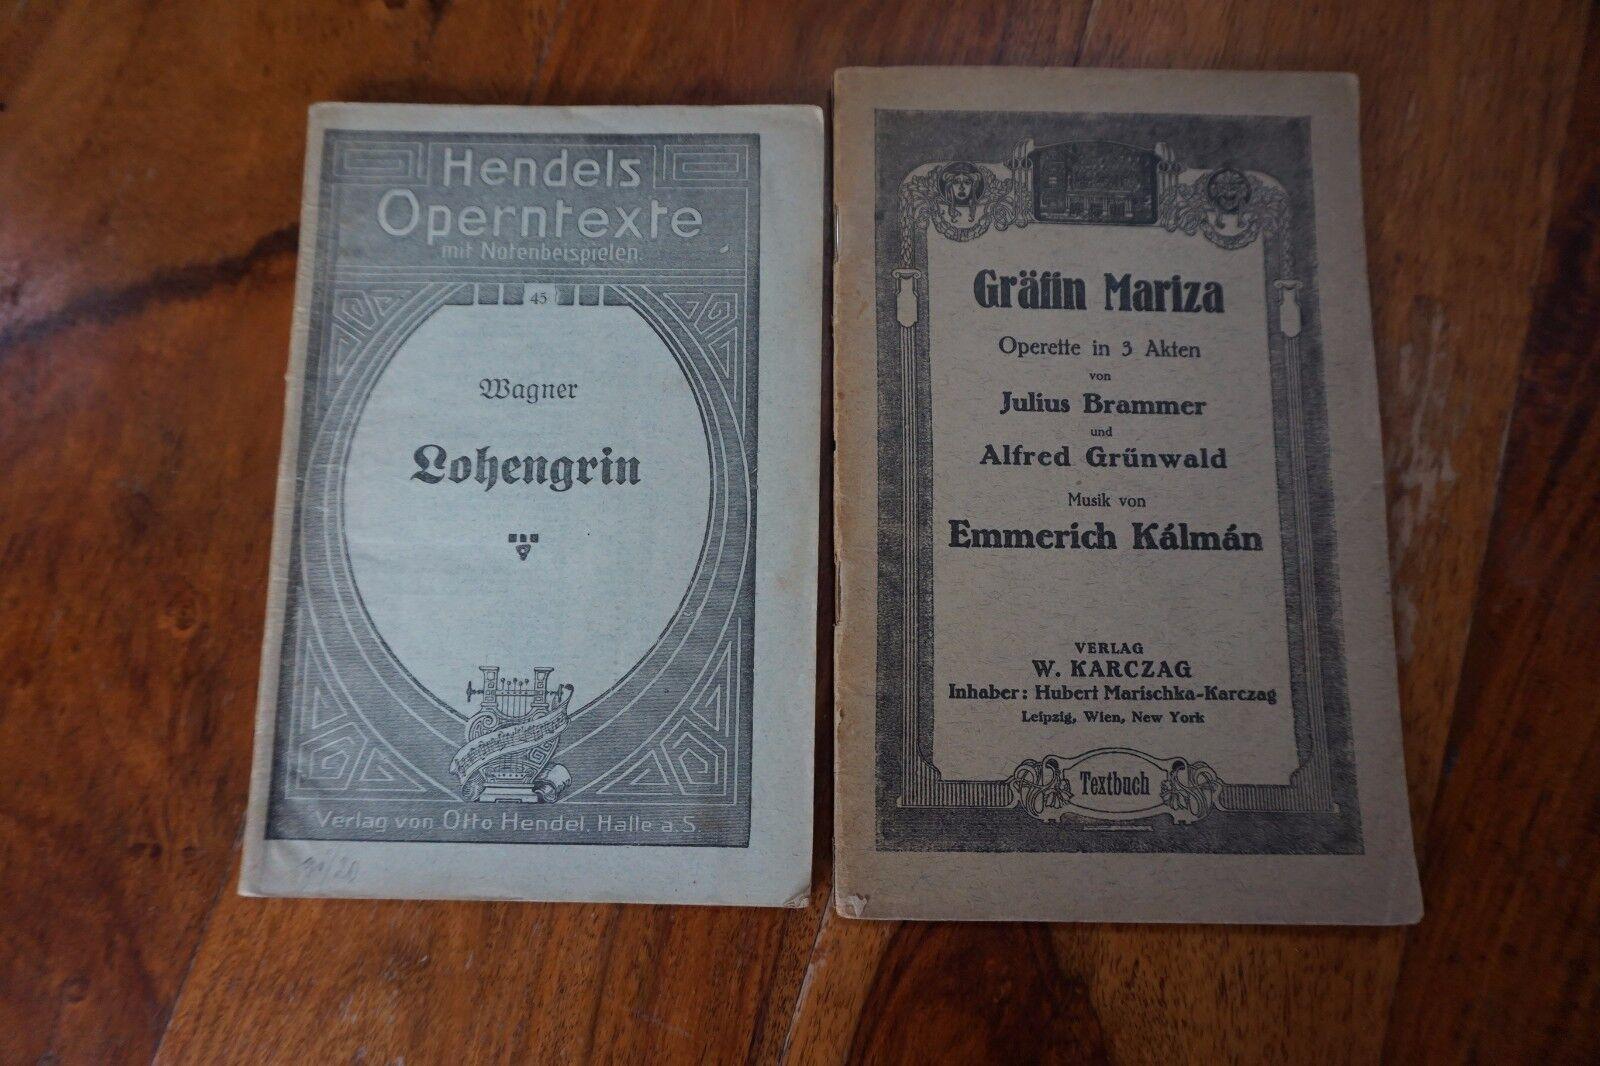 Textbücher Opernbücher Operntexte Gräfin Mariza Lohengrin